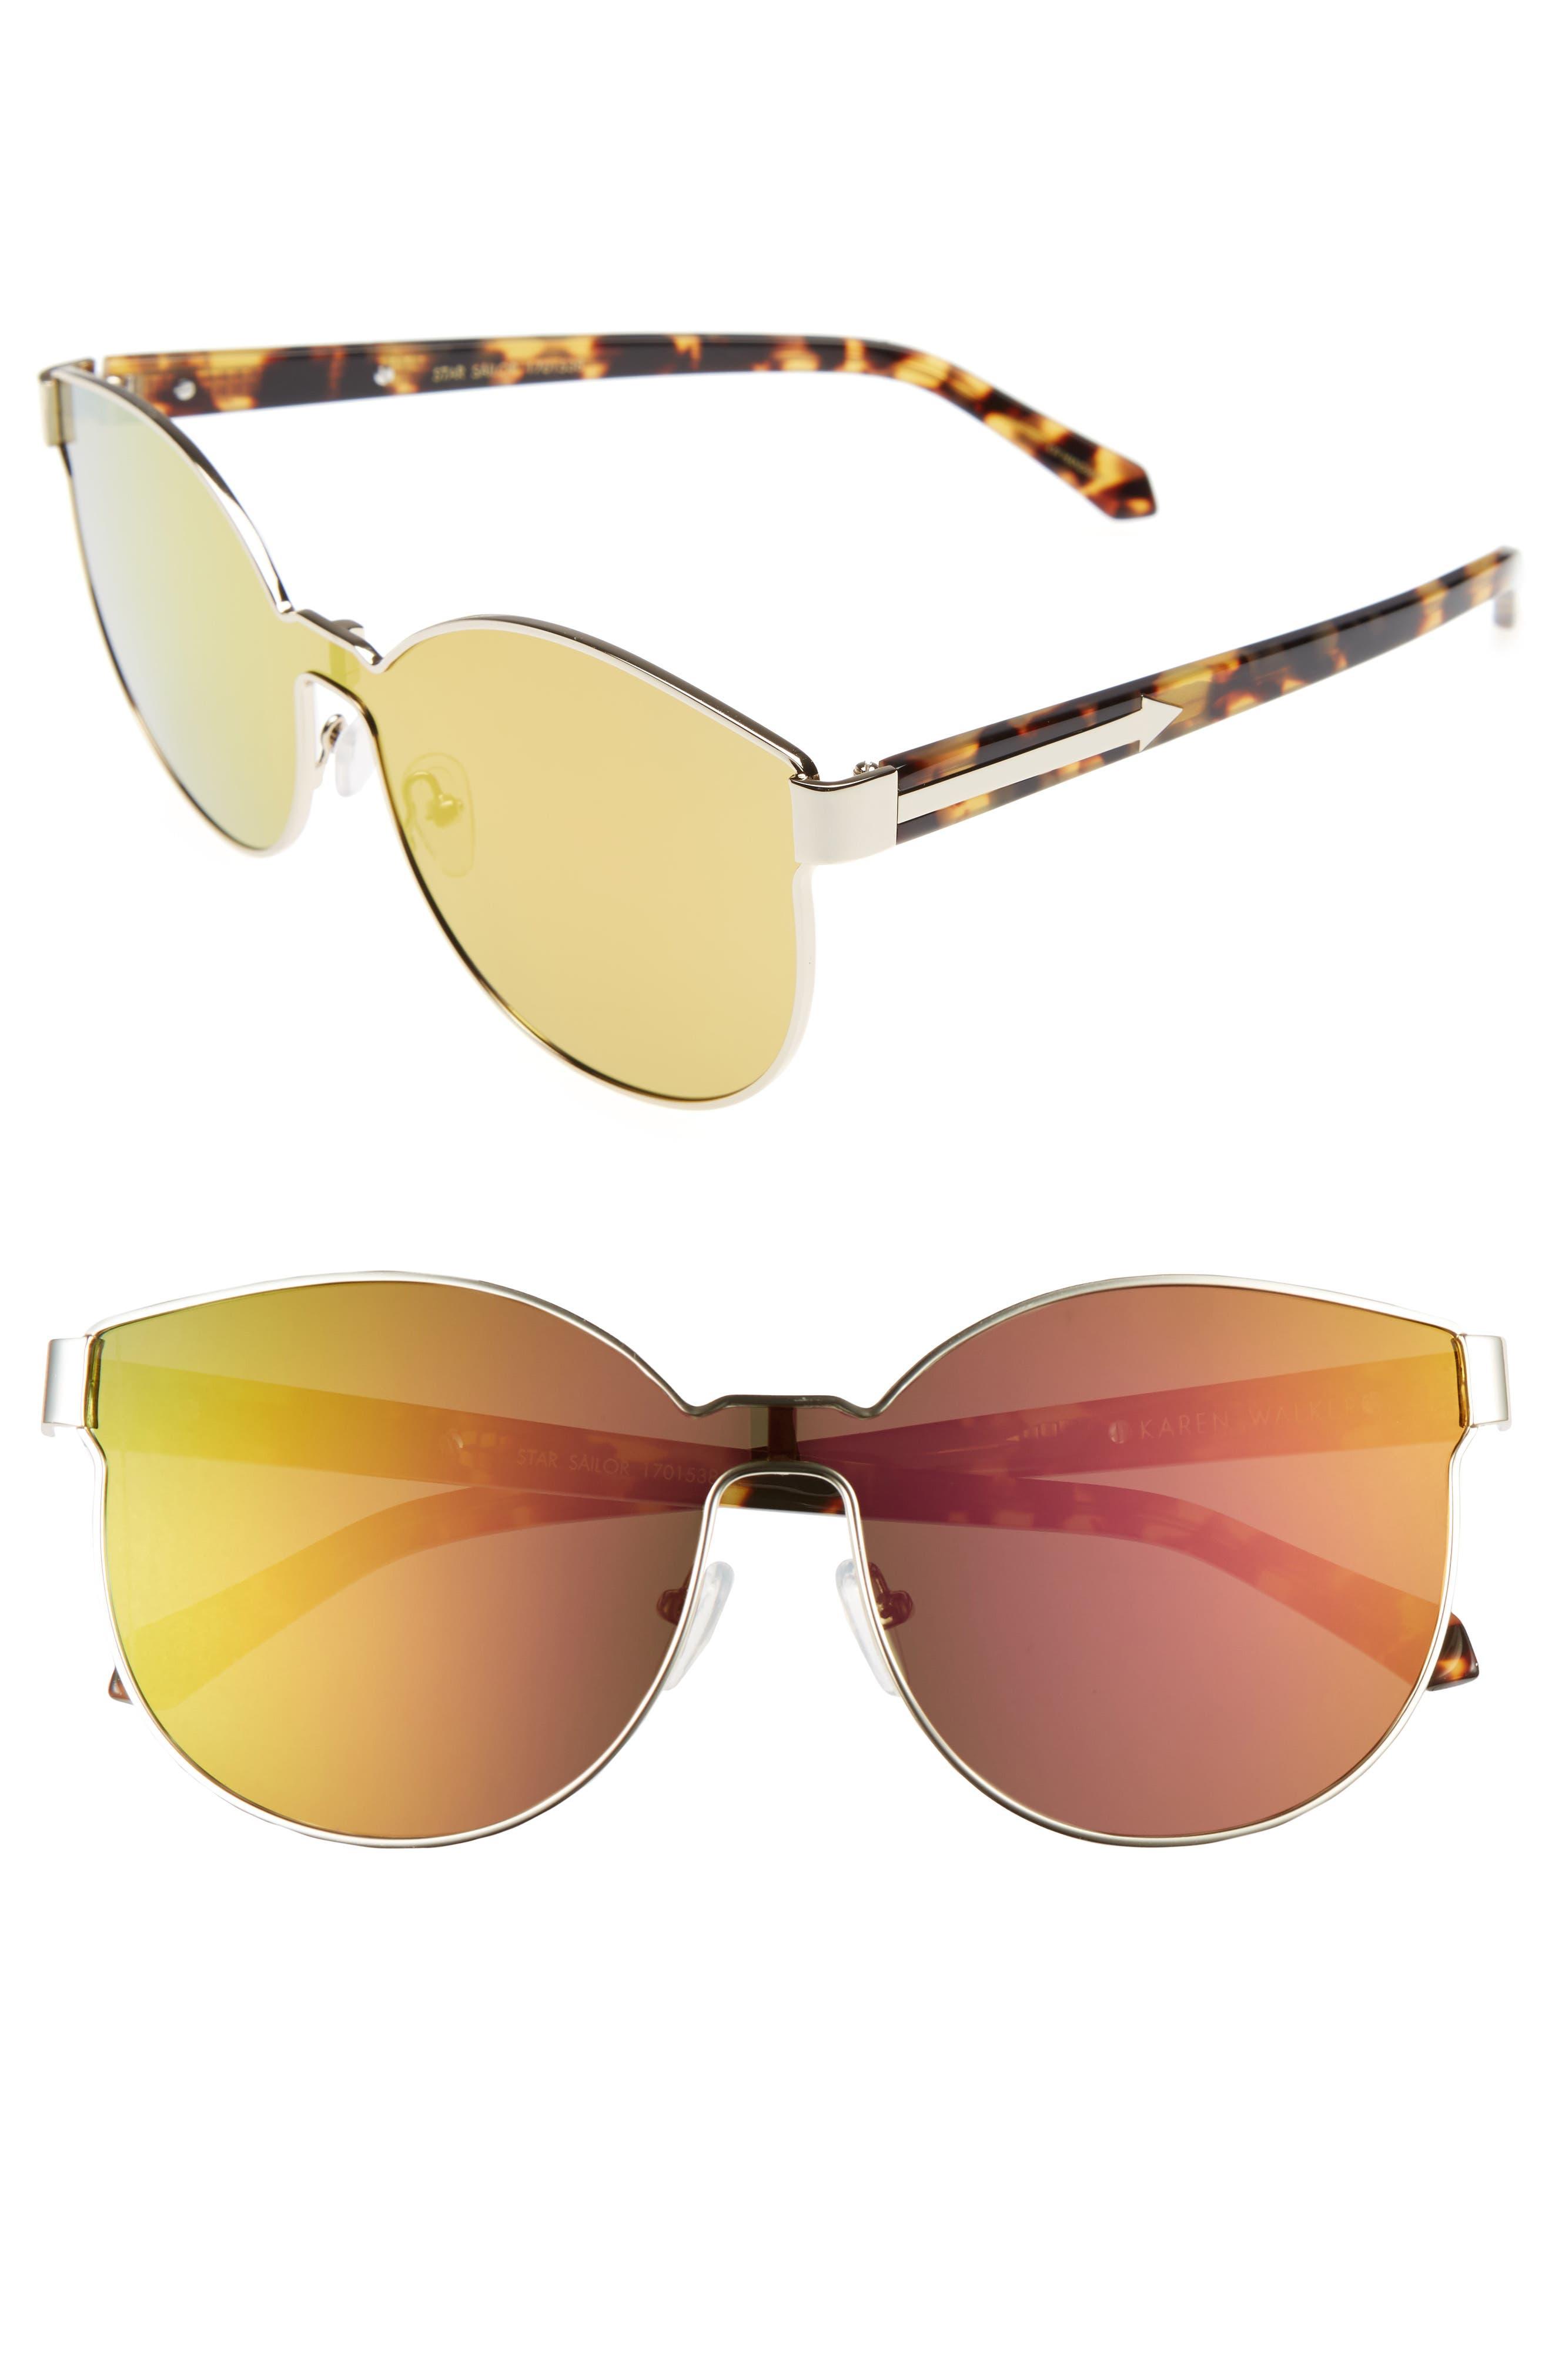 KAREN WALKER Star Sailor 61mm Retro Sunglasses